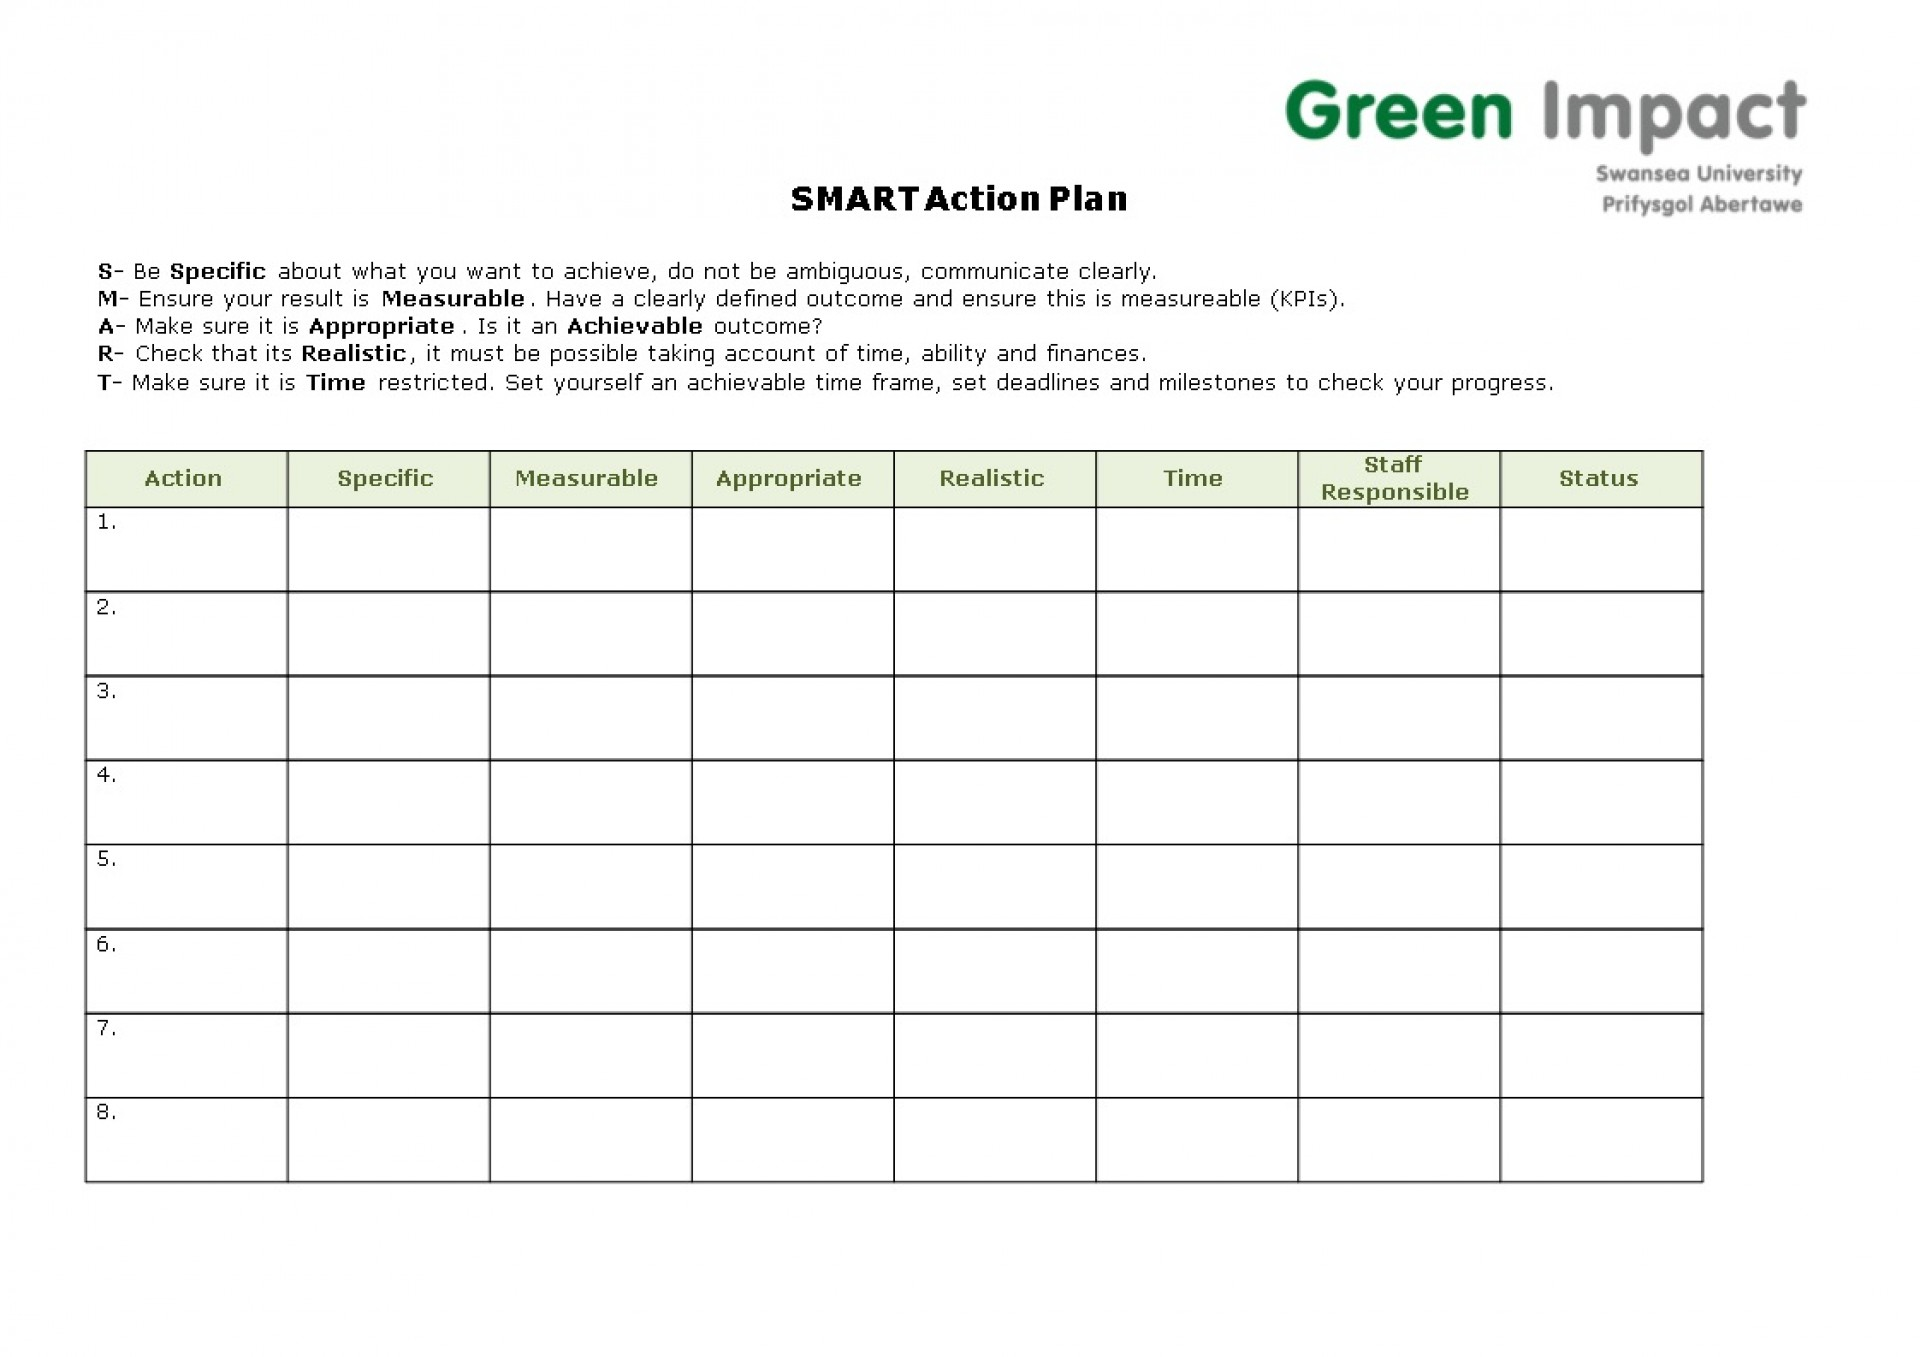 000 Impressive Smart Action Plan Template High Definition  Nursing Example For Busines Free1920